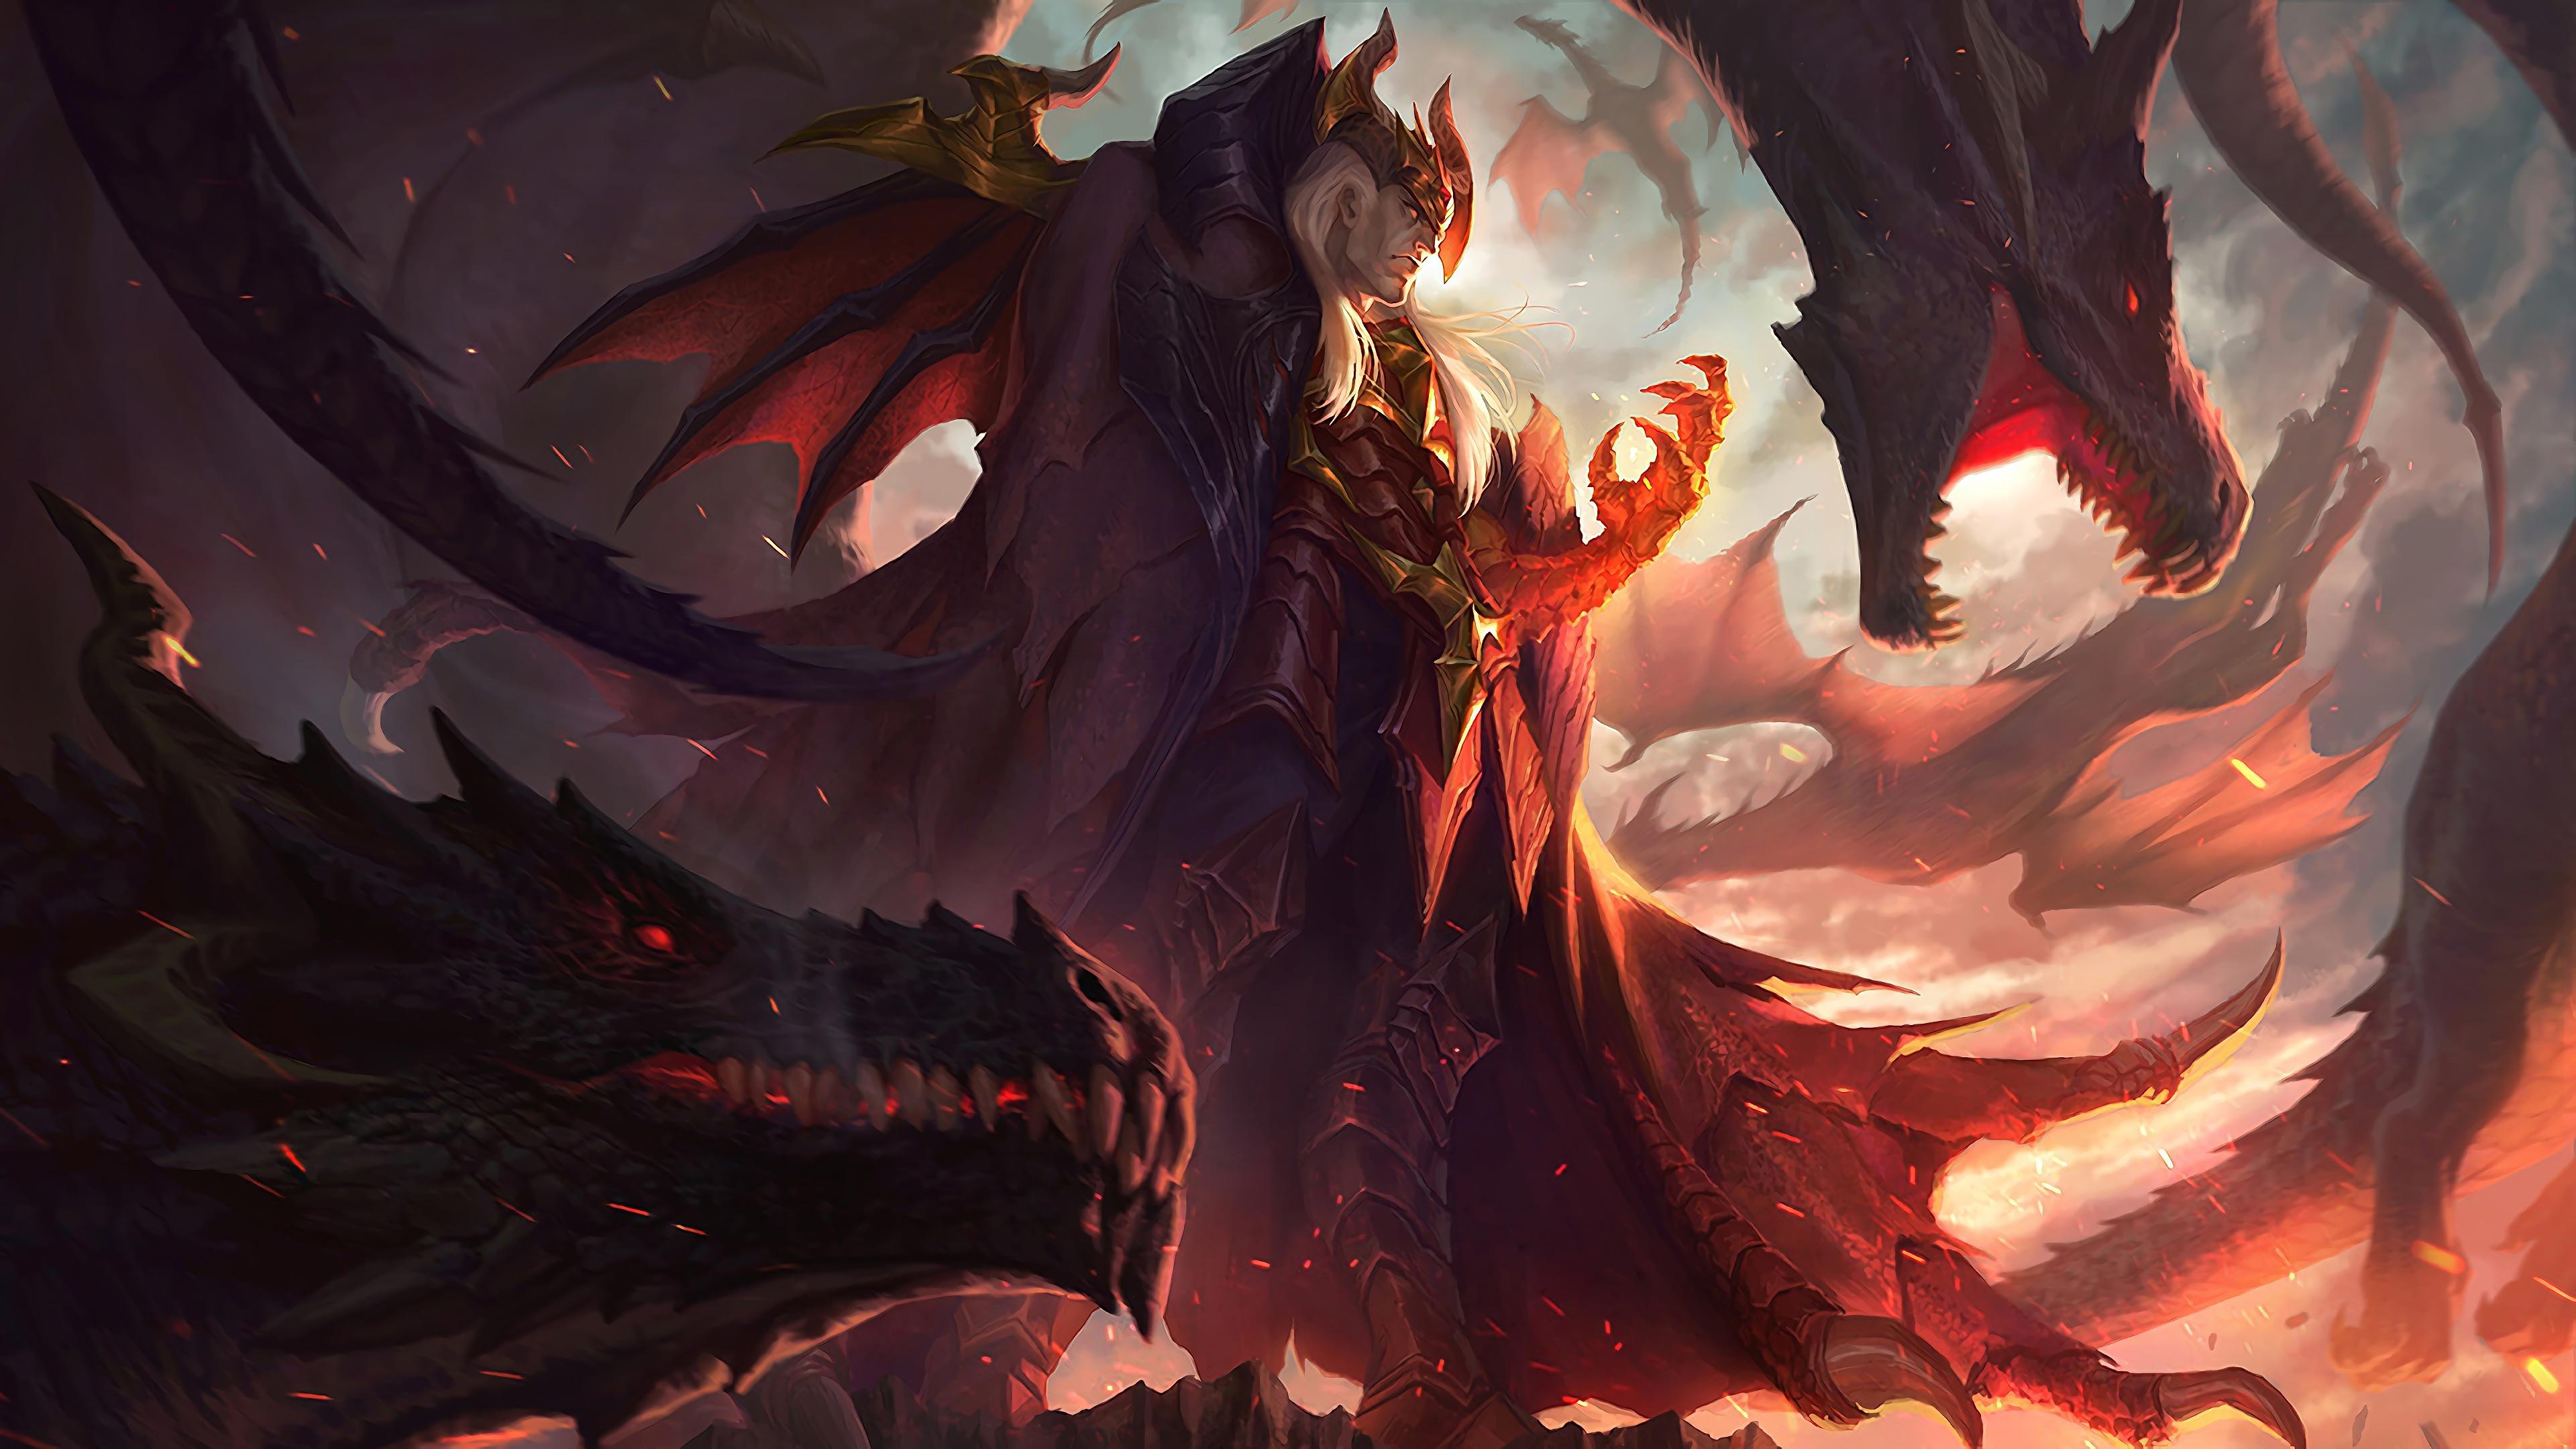 dragon master swain lol splash art league of legends lol 1574102850 - Dragon Master Swain LoL Splash Art League of Legends lol - Swain, league of legends